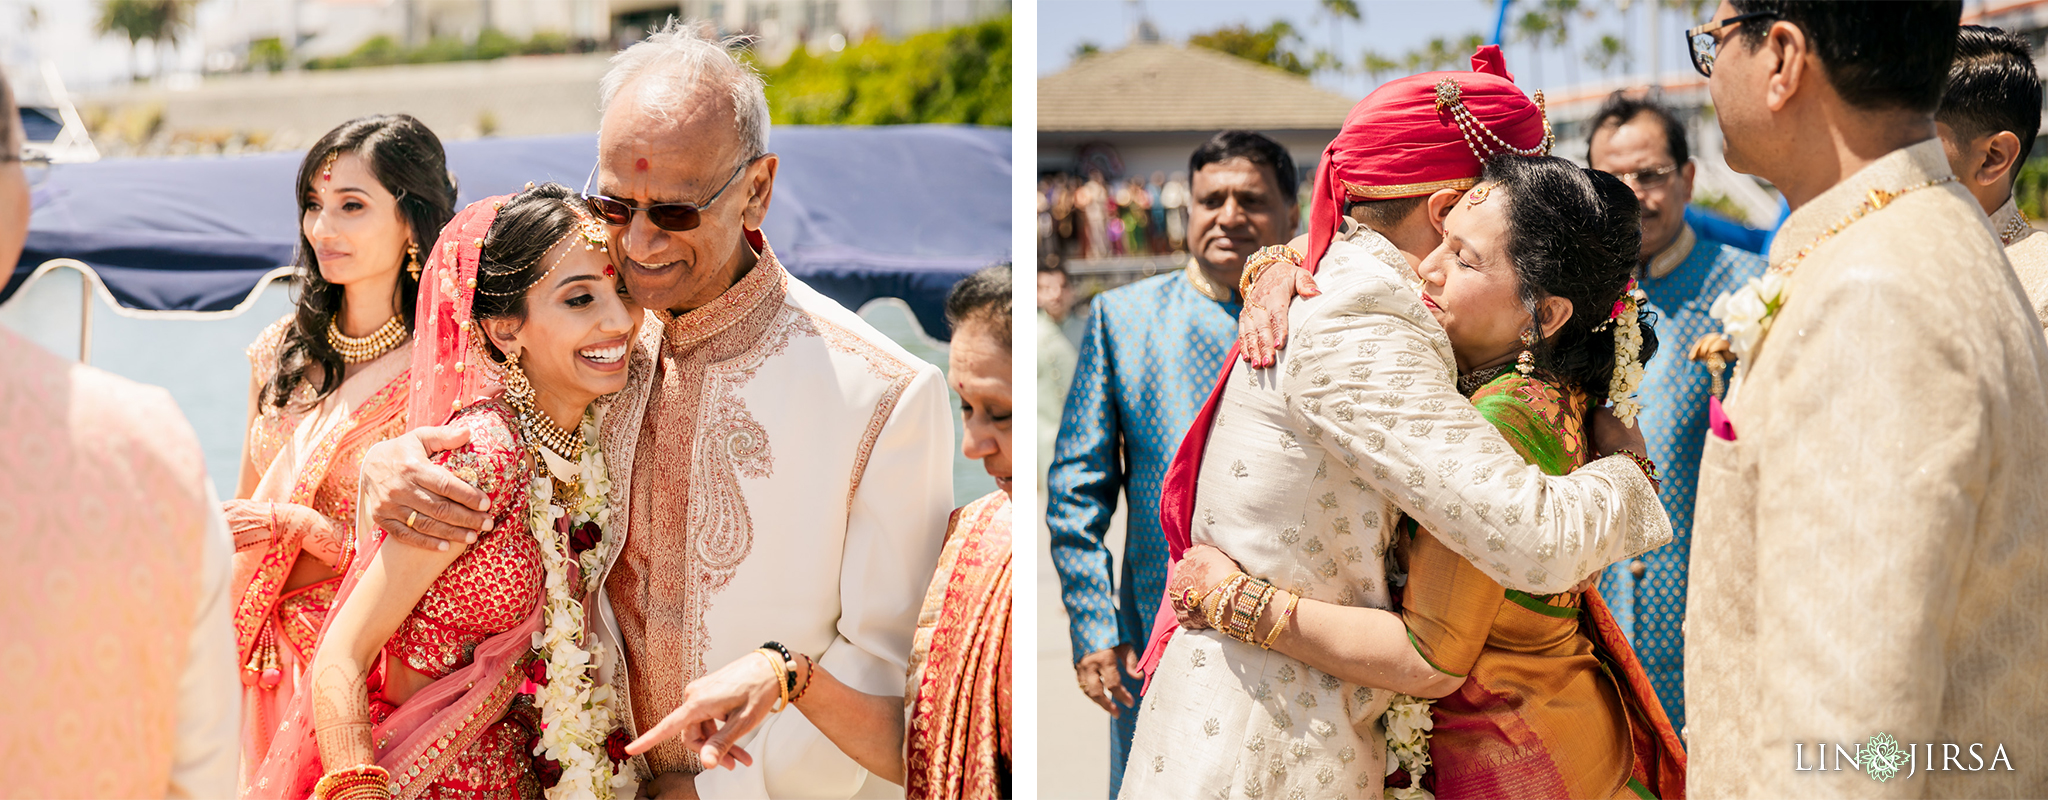 29 Loews Coronado Bay Resort San Diego Indian Wedding Photography